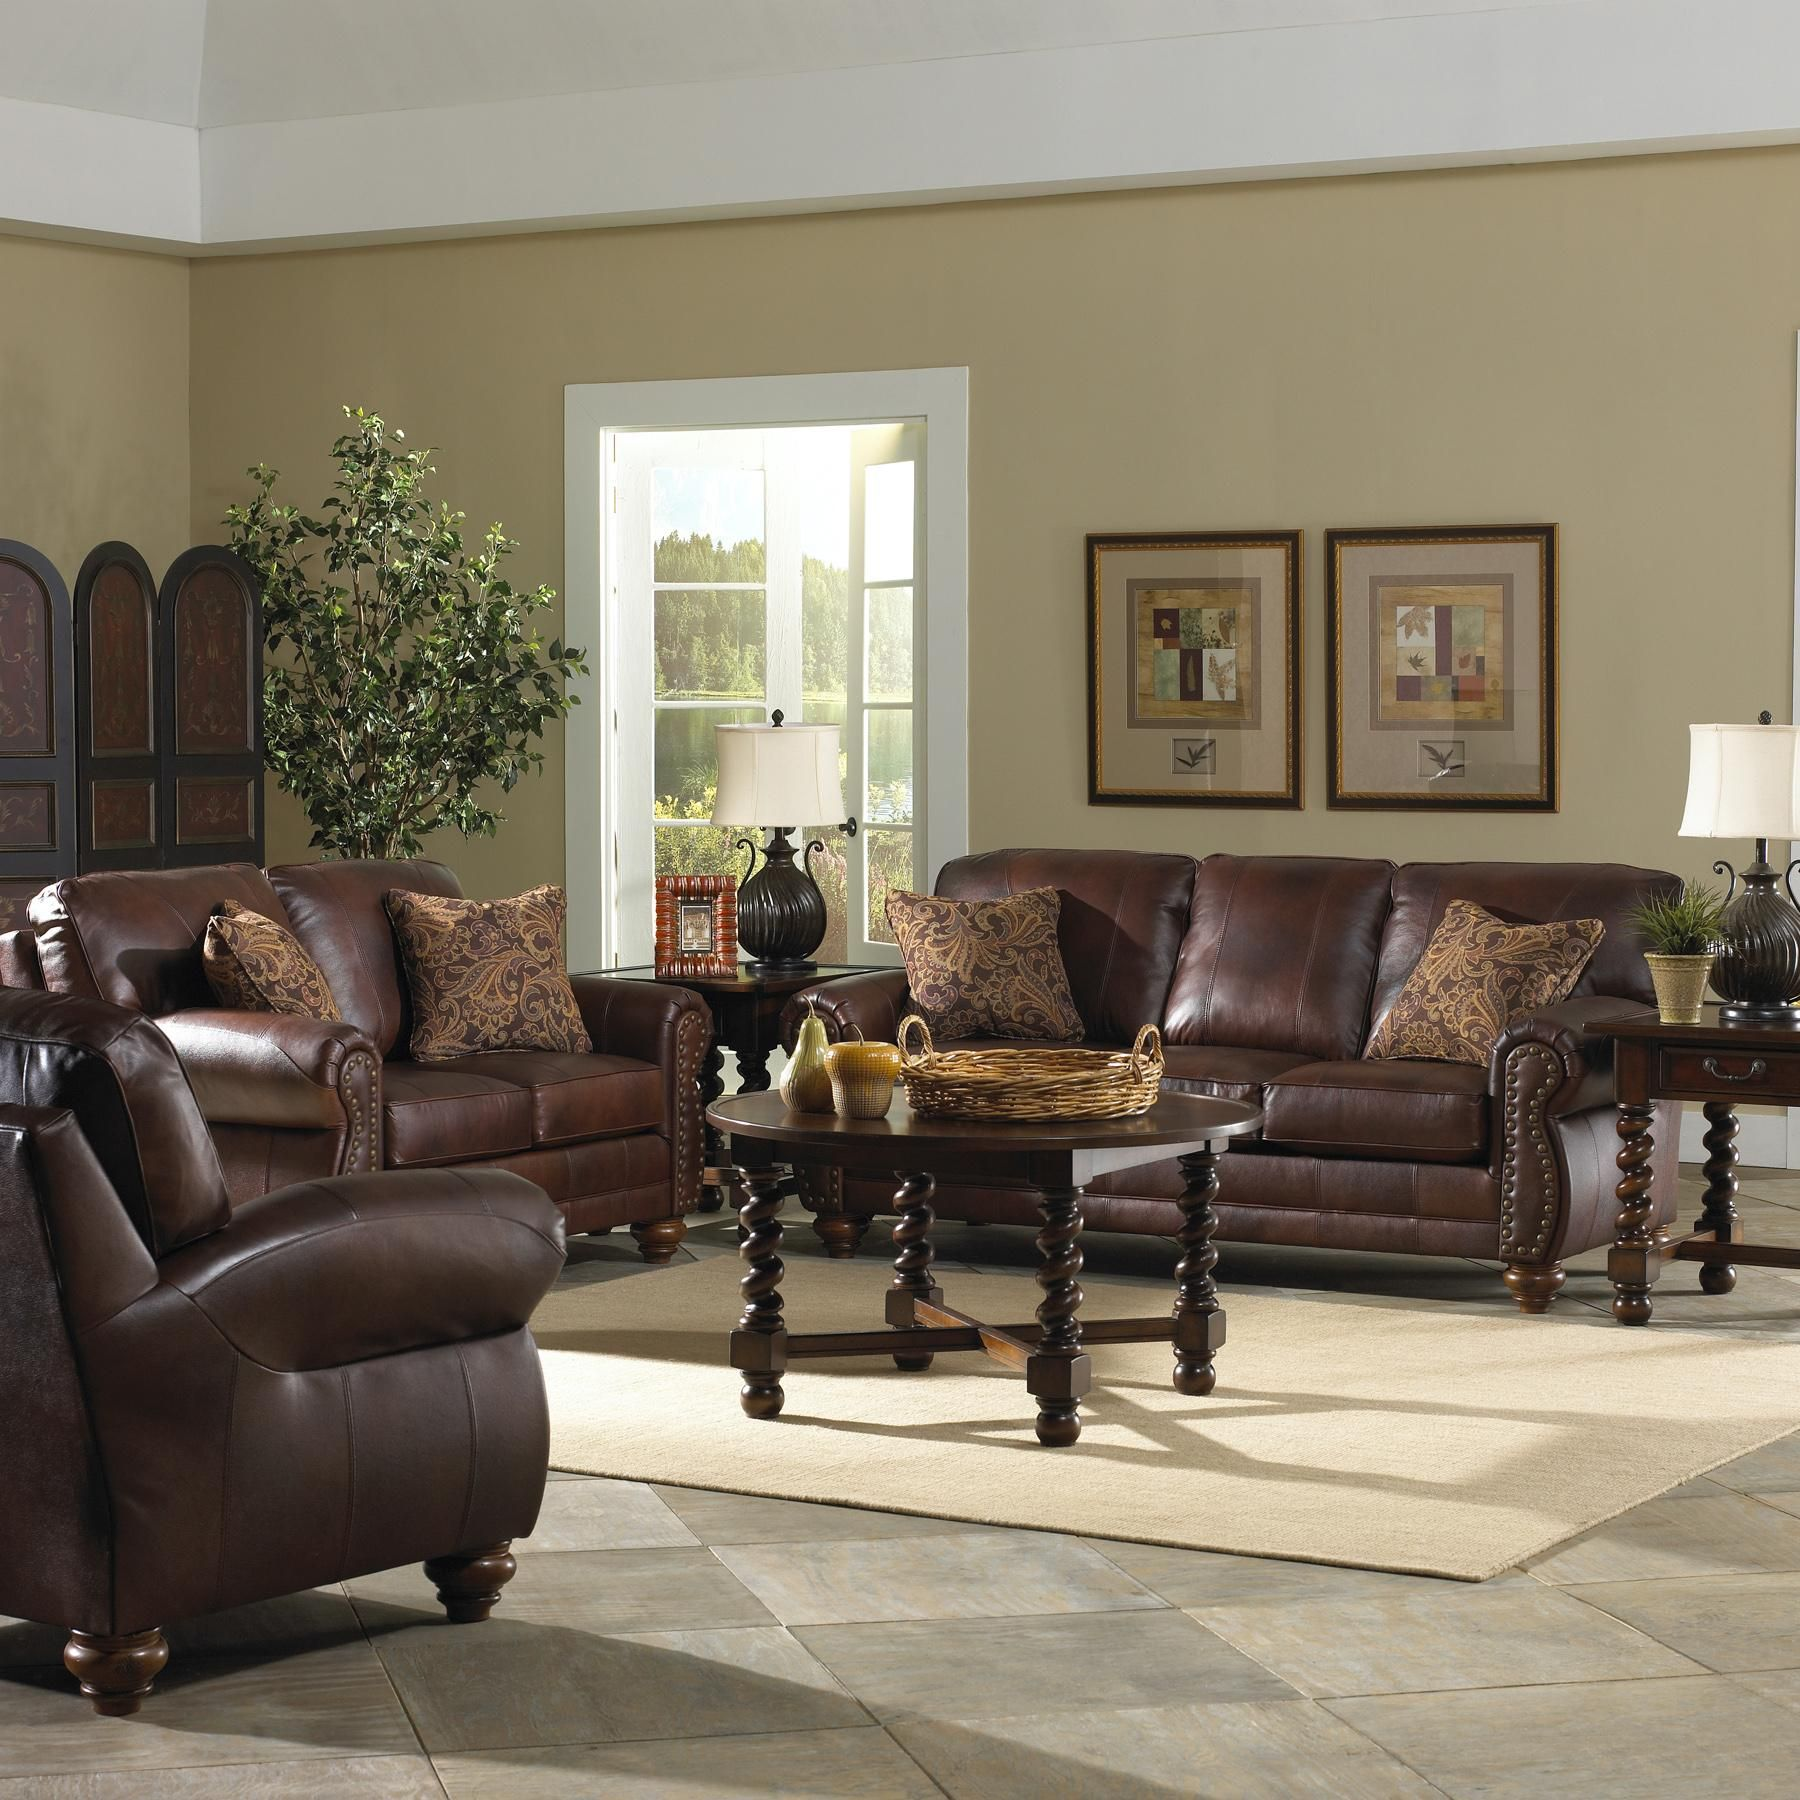 Dark Brown Leather Sofa Baer Furniture Osmond Stationary